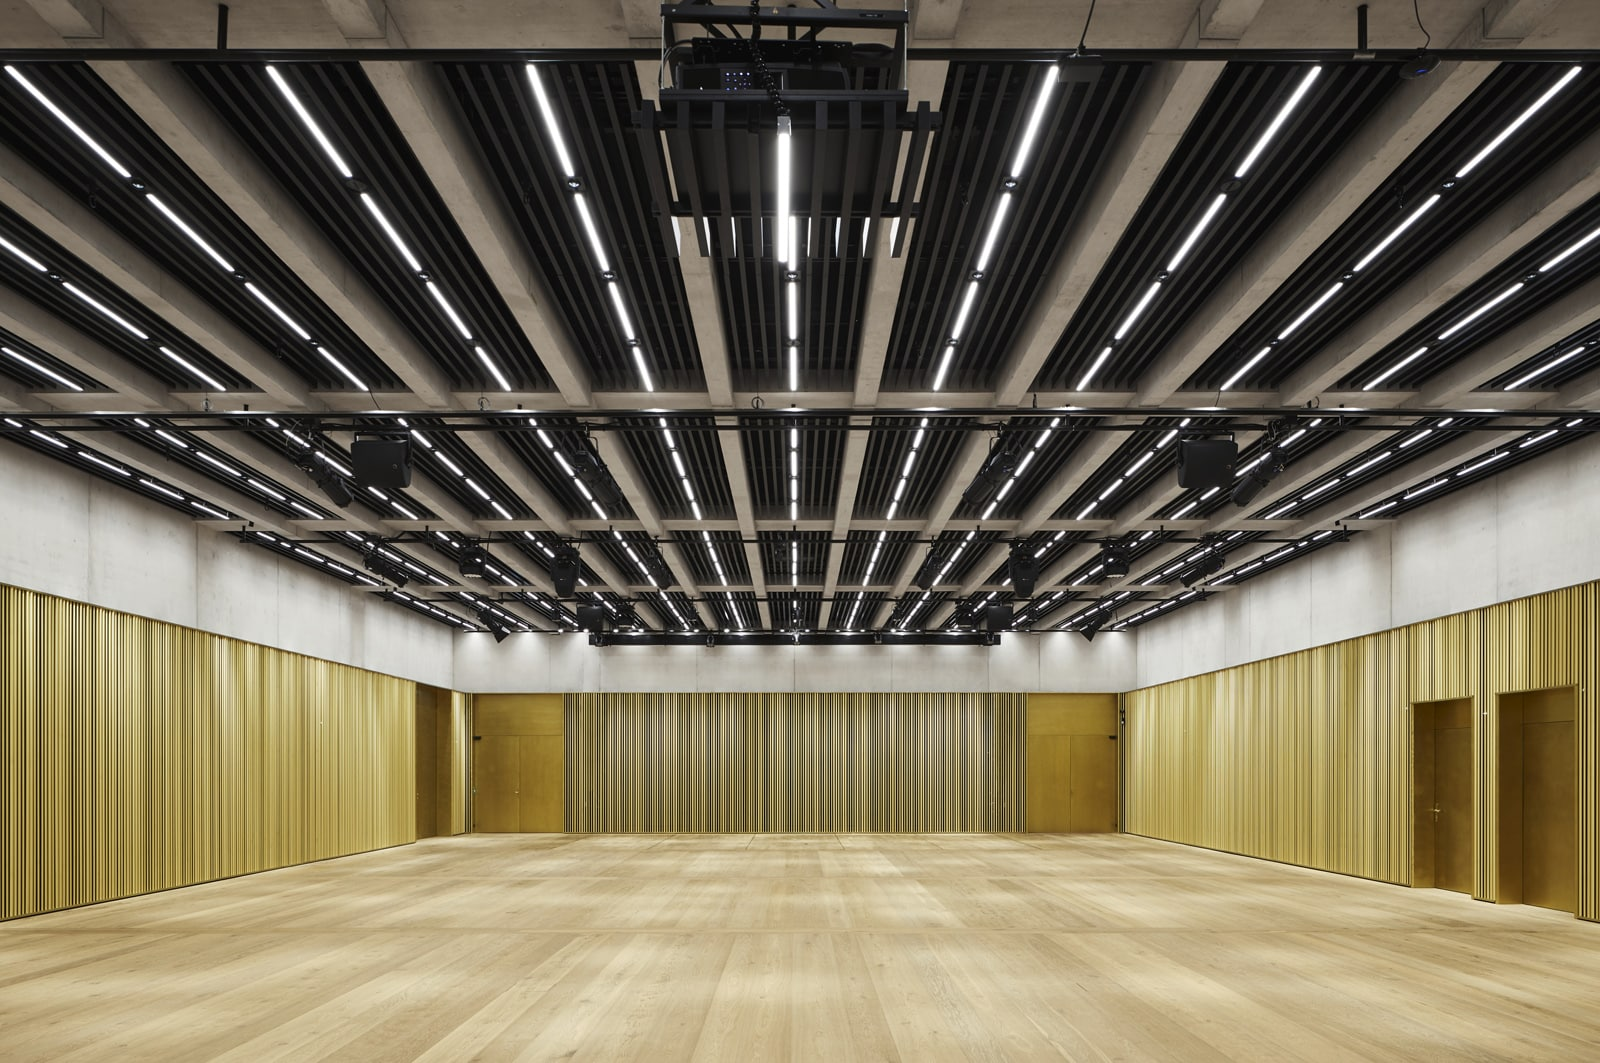 Kunsthaus Zürich  - 20210712 Chipperfield Kunsthaus 10 53